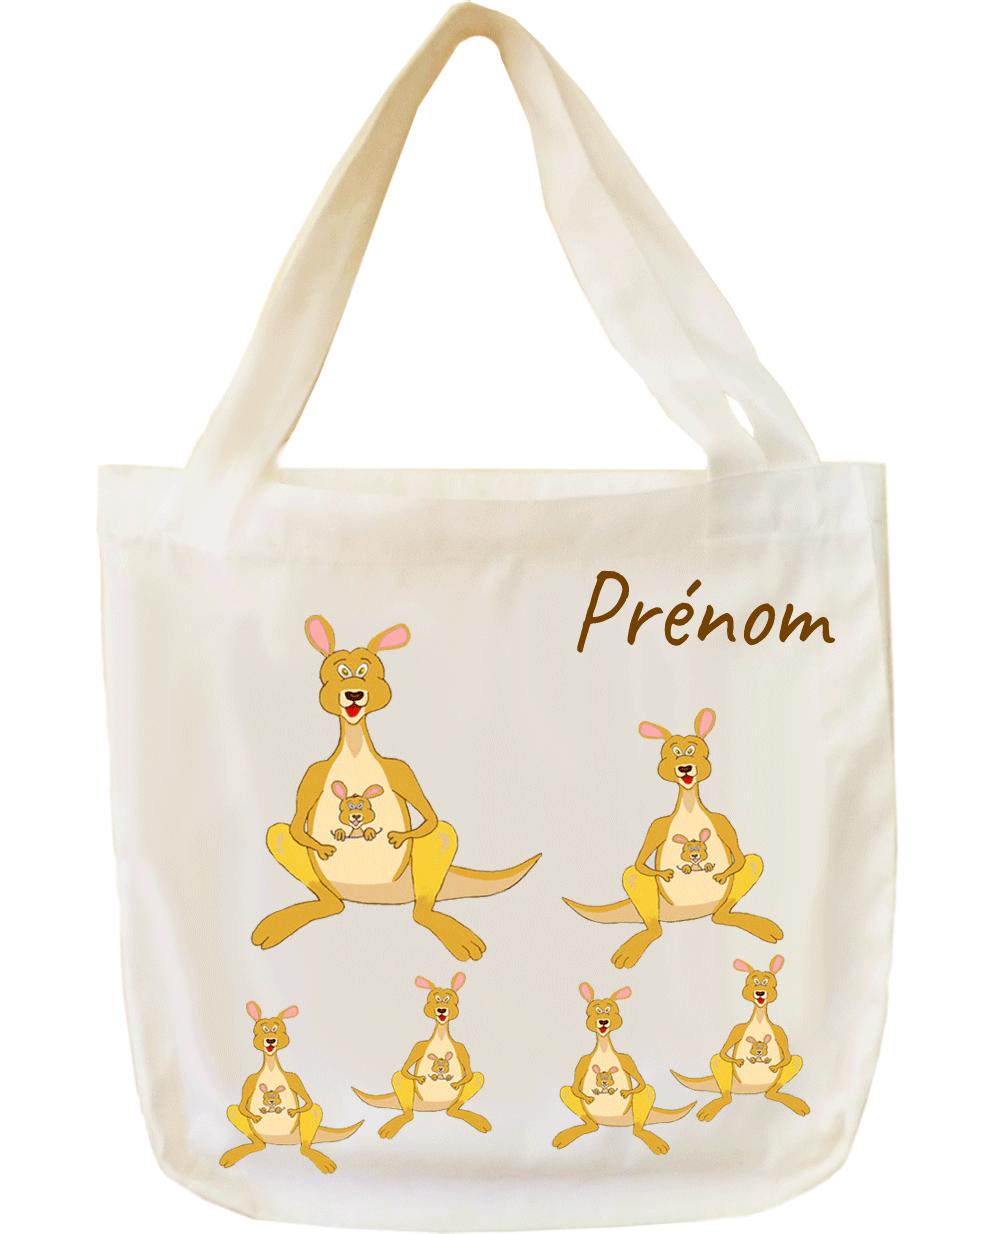 tote-bag;sac;cabas;texti;cadeaux;personnalisable;personnalisation;personnalise;prenom;animal;kangourou